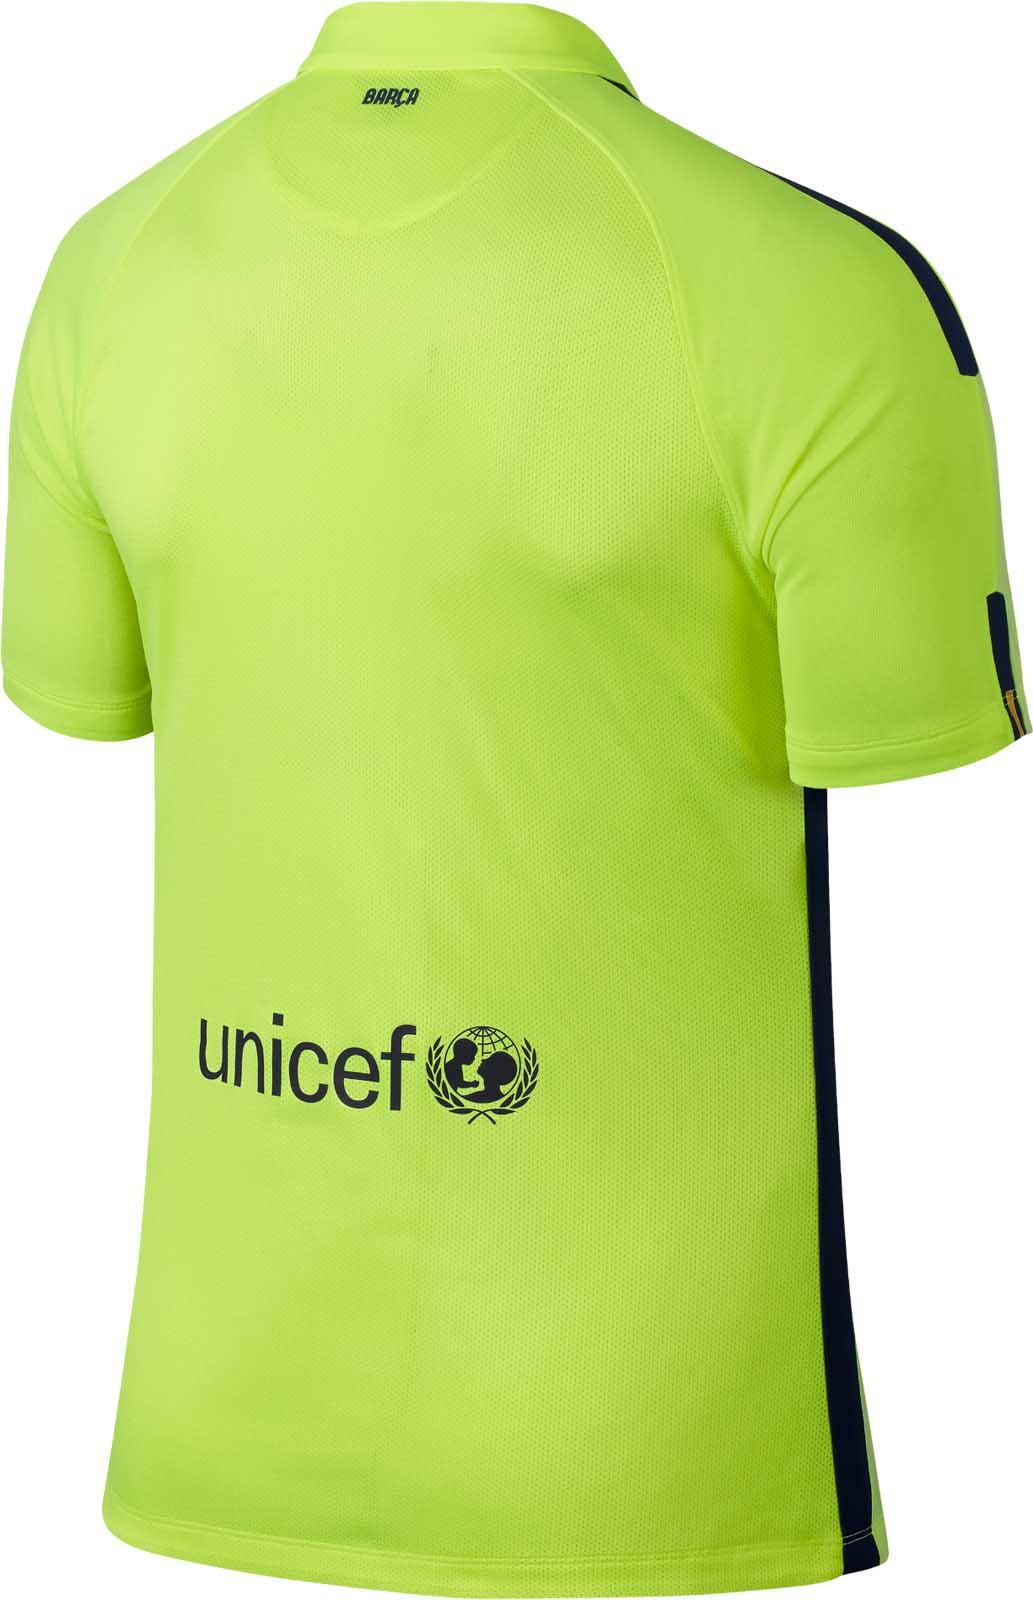 FC Barcelona 2014-15 Third Kit 8b6771213b0c6